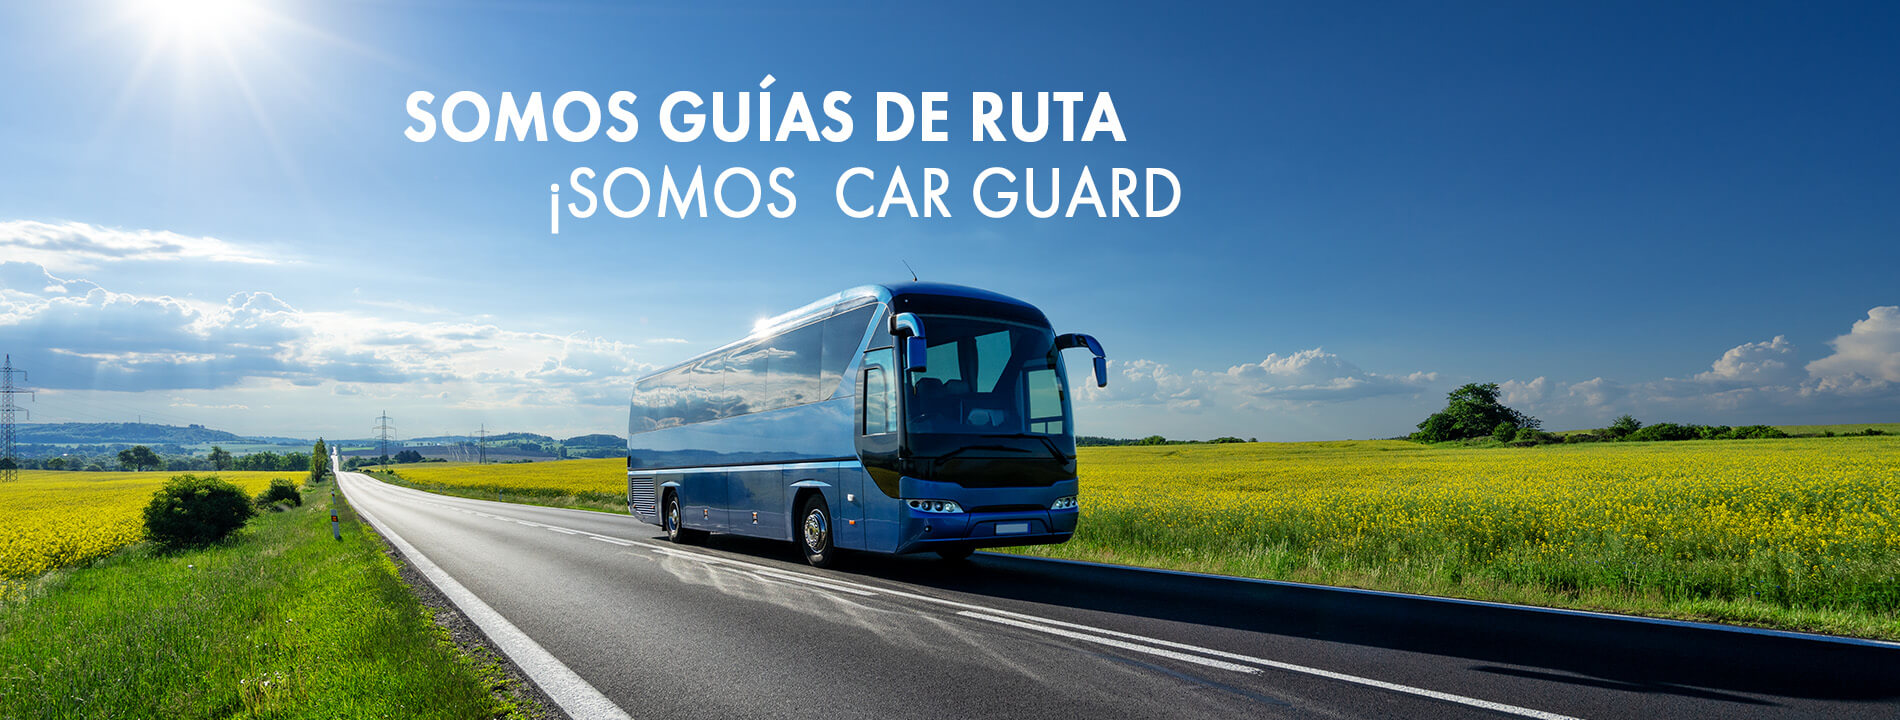 Somos guías de ruta - Somos Car Guard